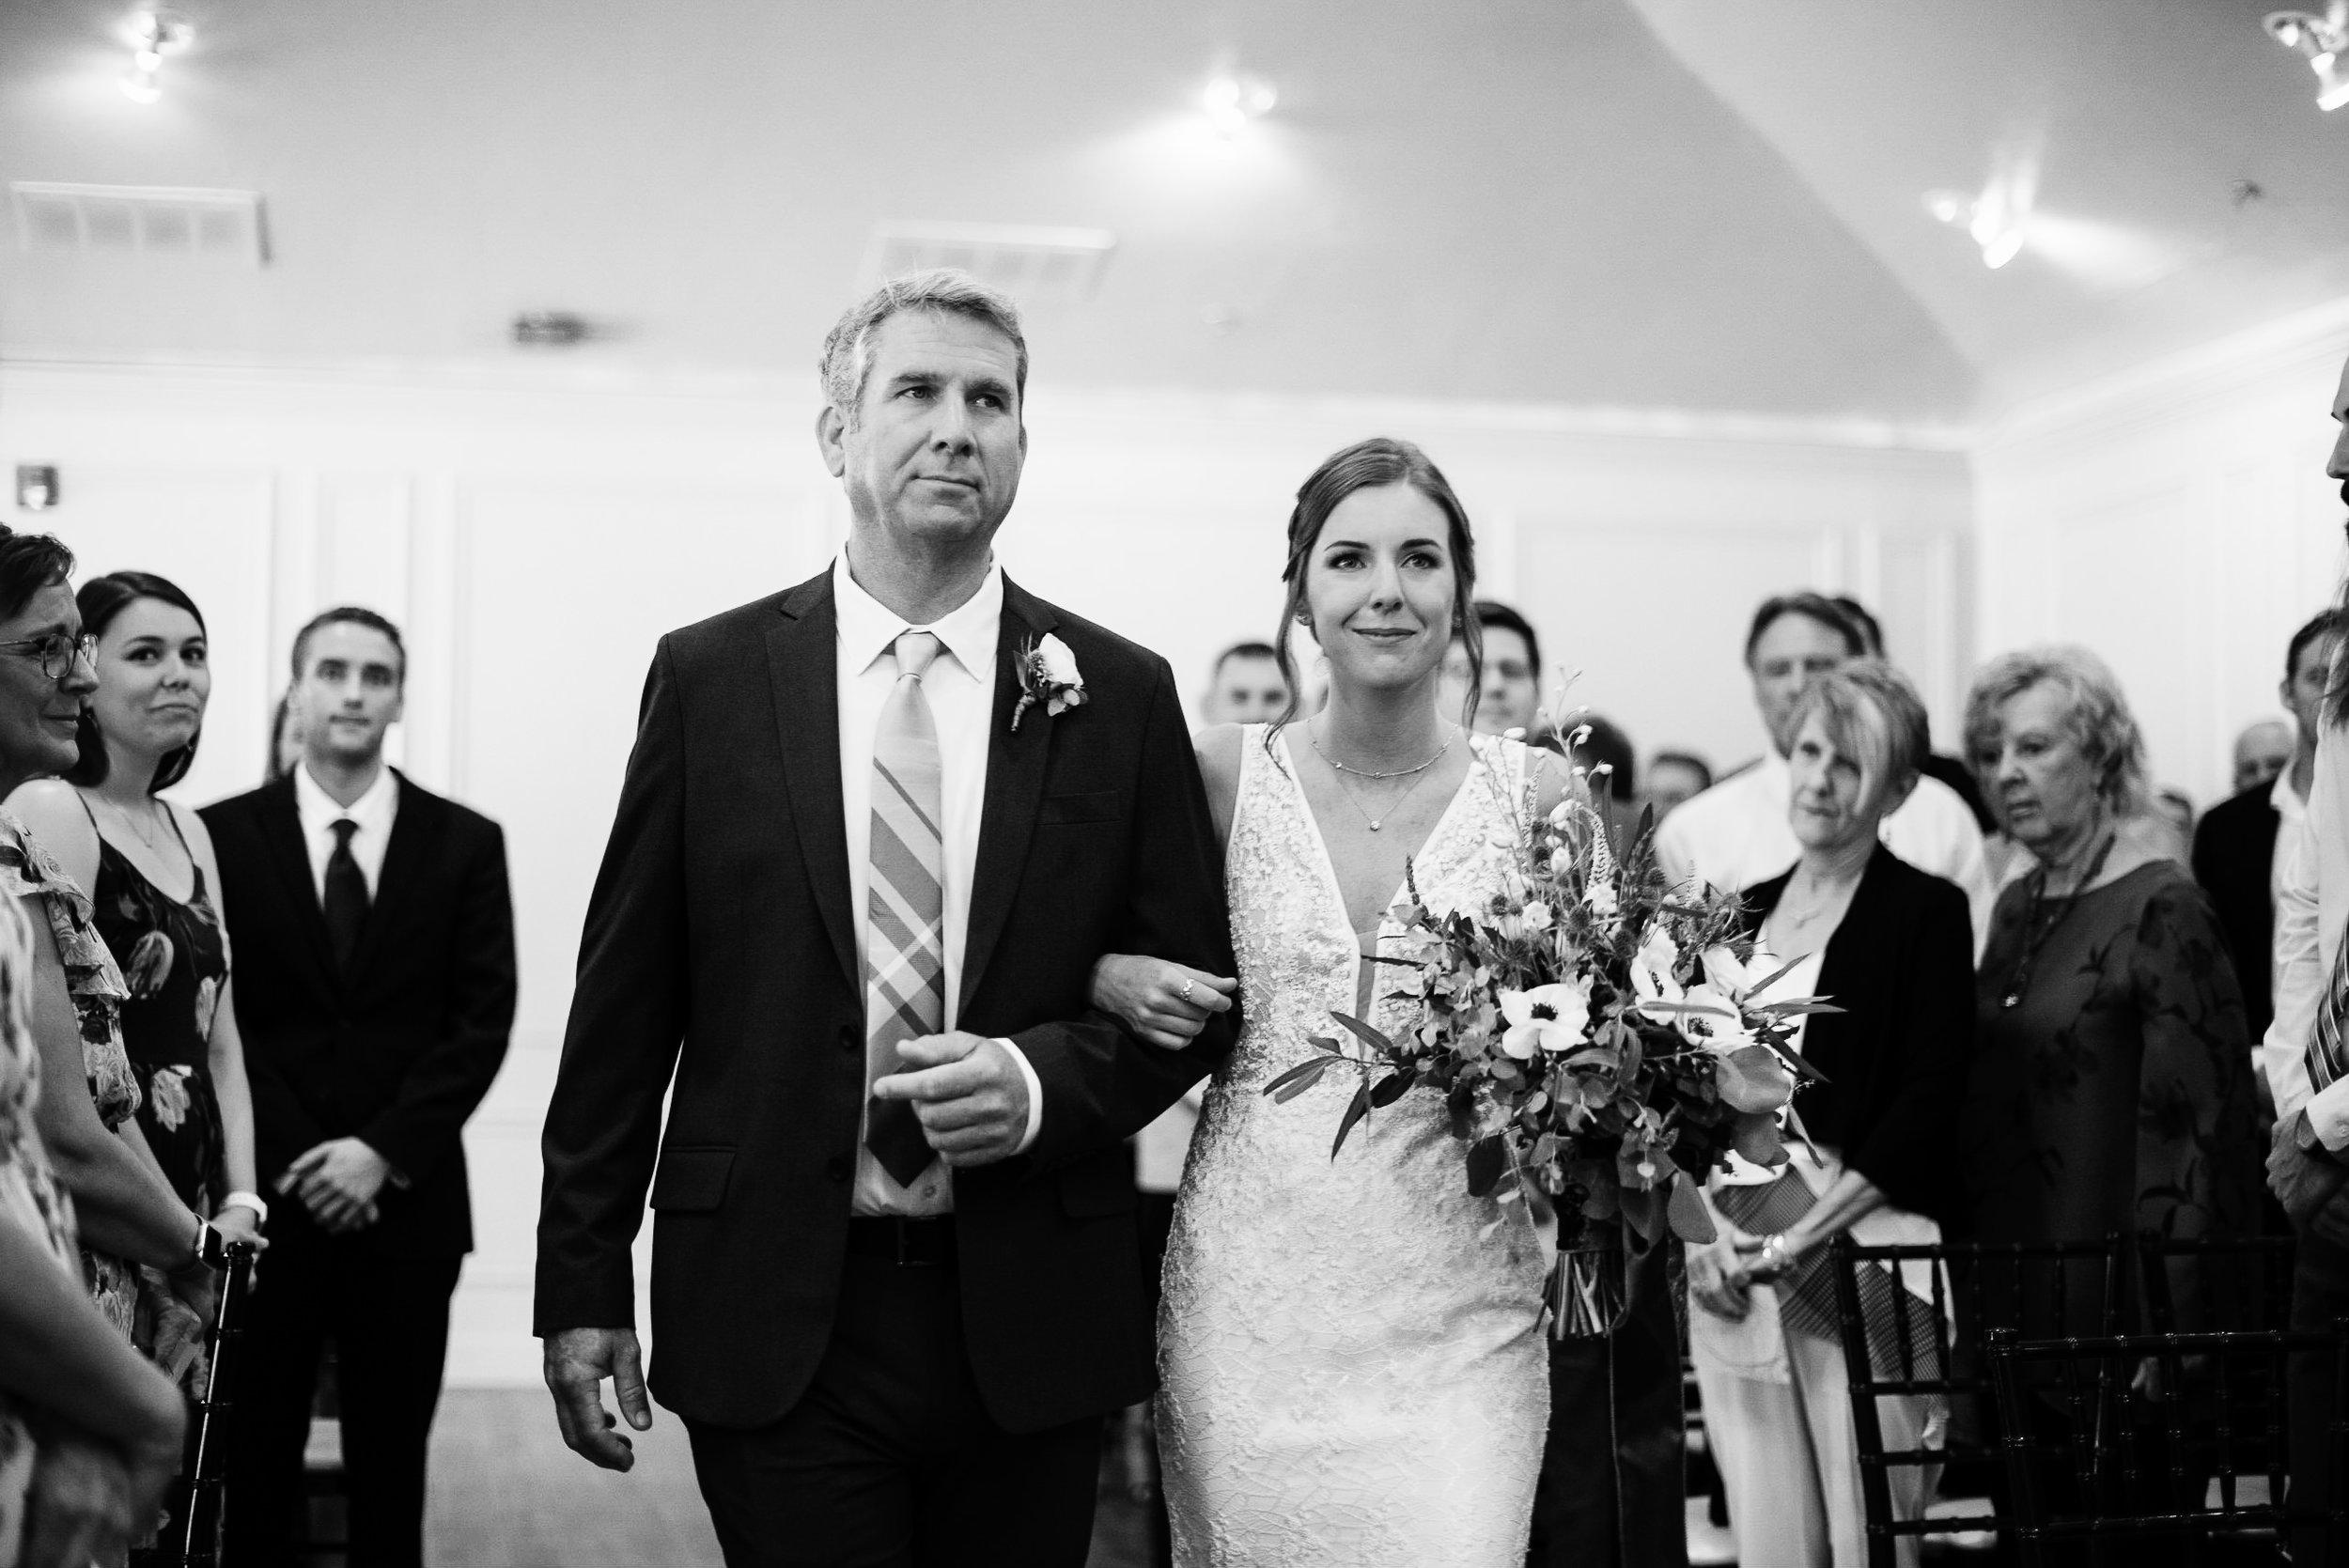 okc-wedding-photographer-coles-garden-wedding-okc-best-wedding-photographers-113.jpg